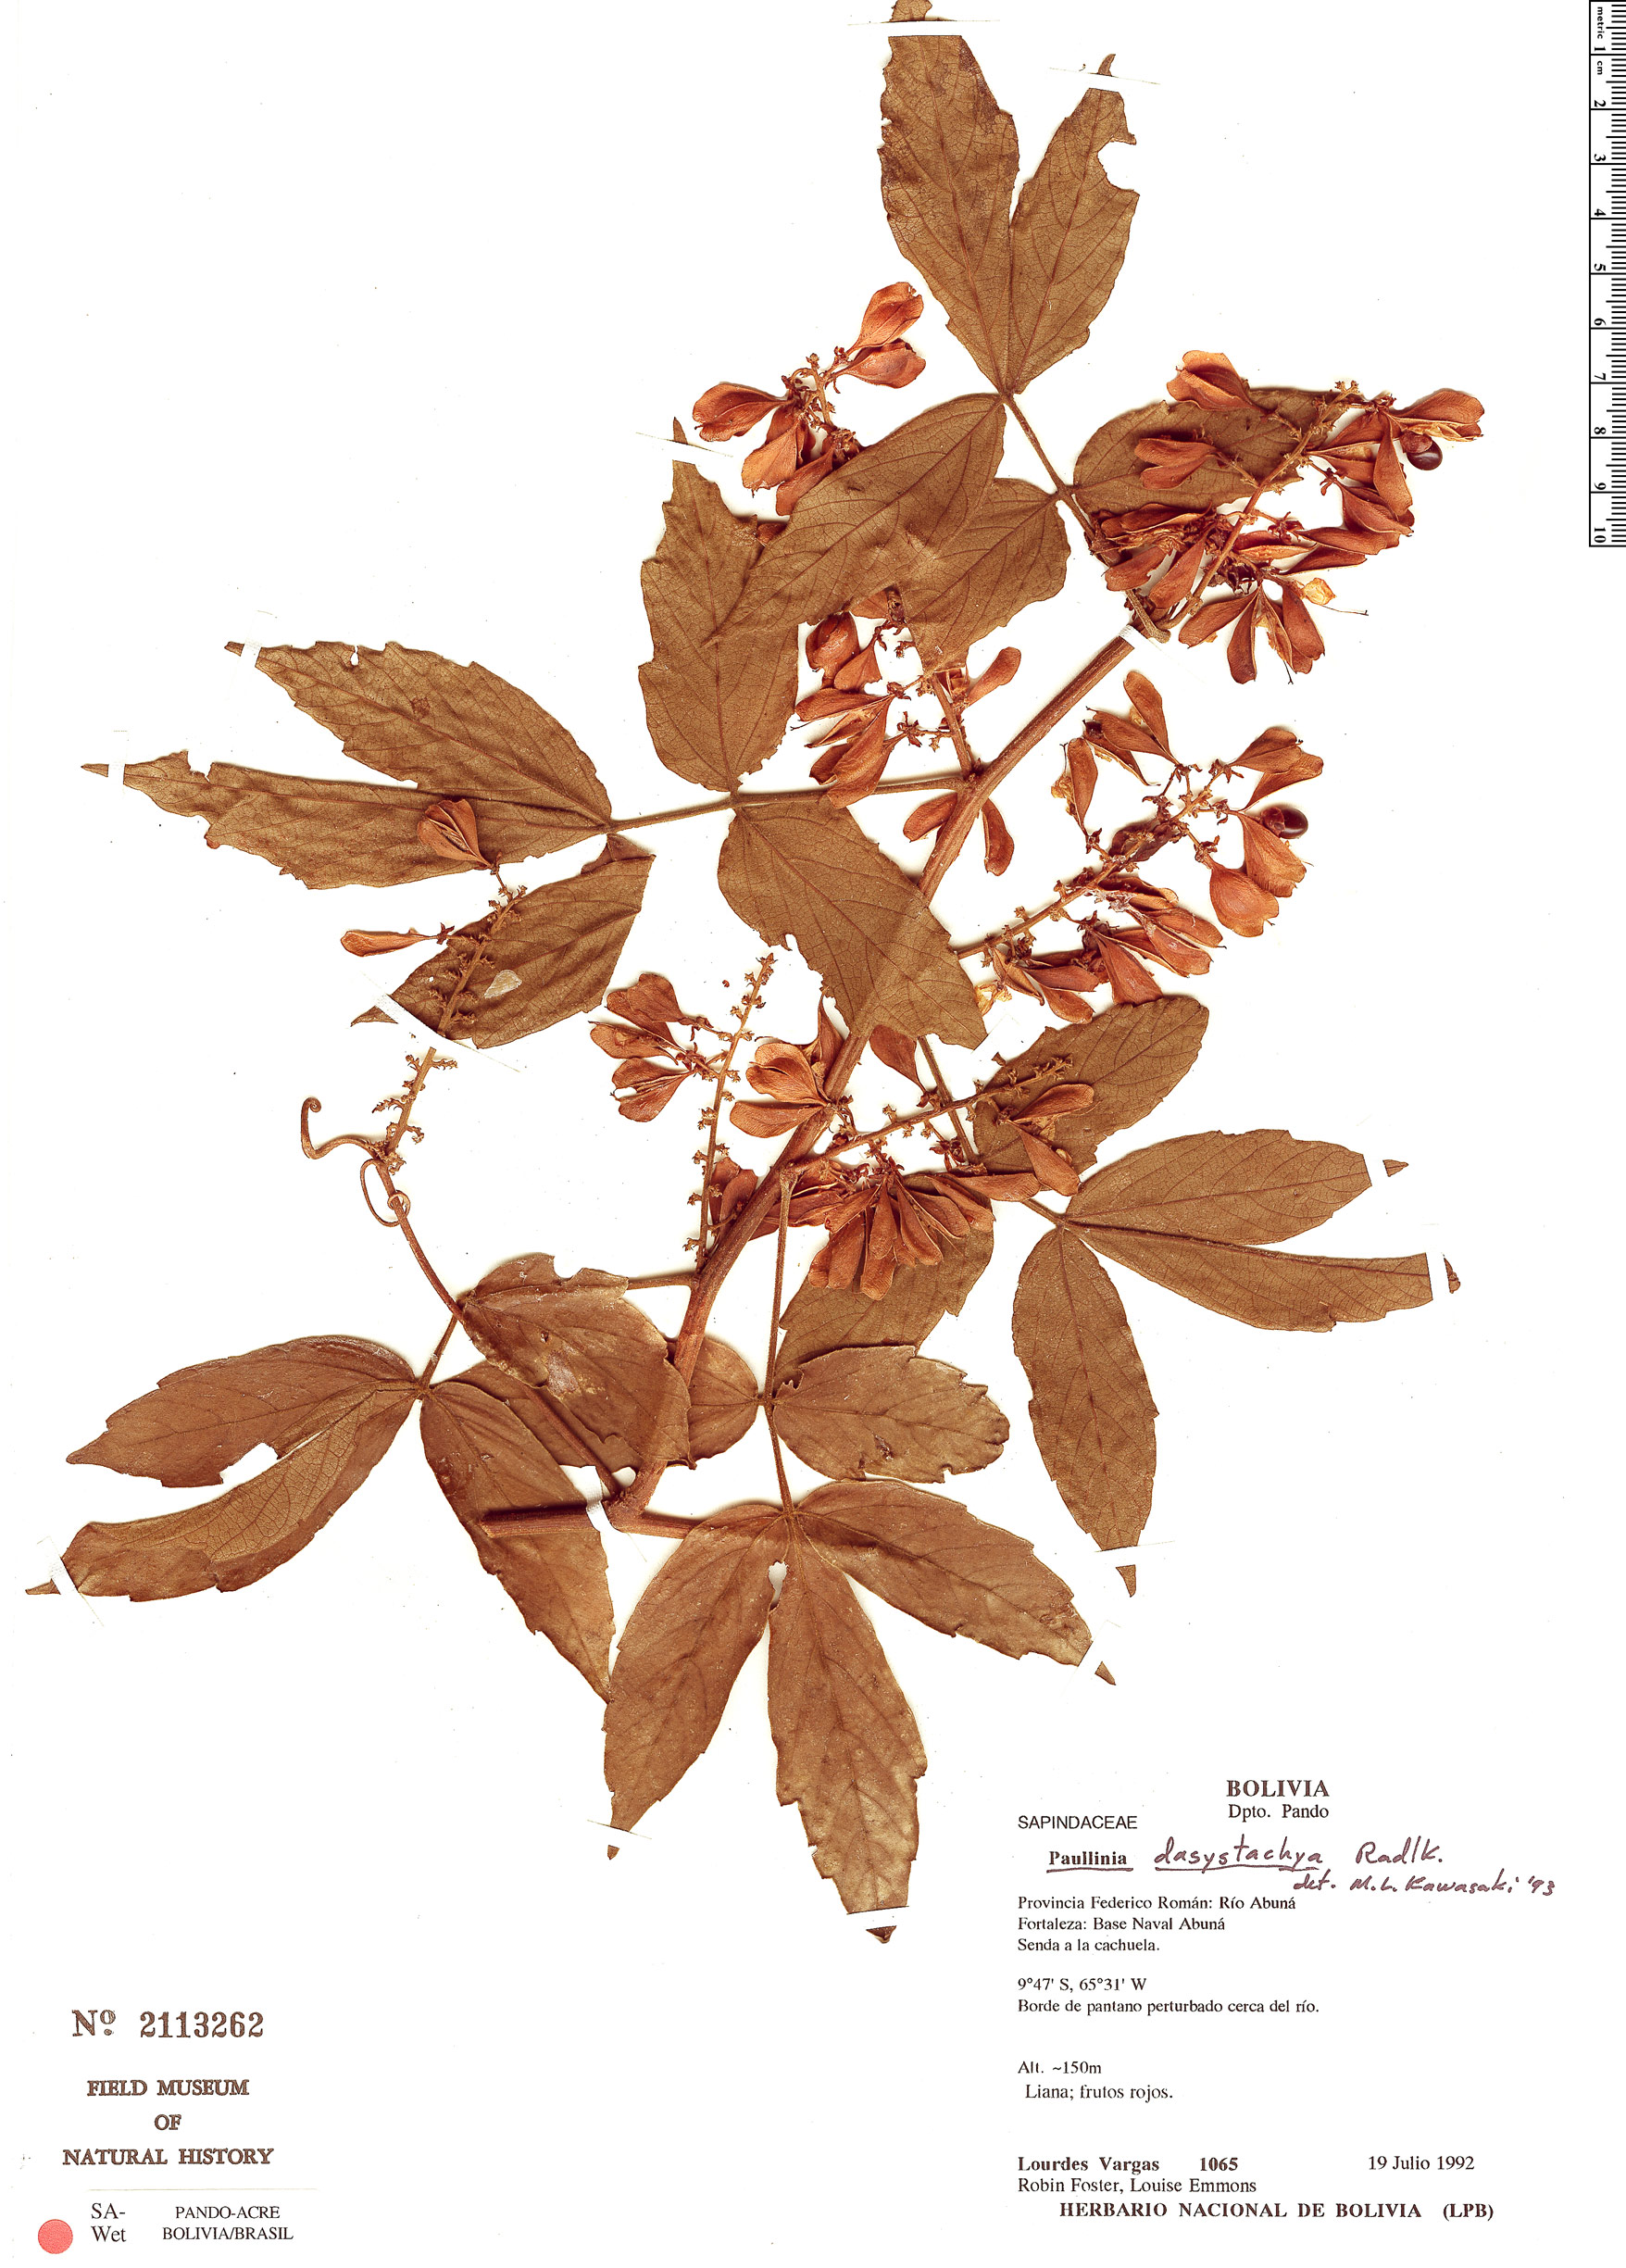 Specimen: Paullinia dasystachya